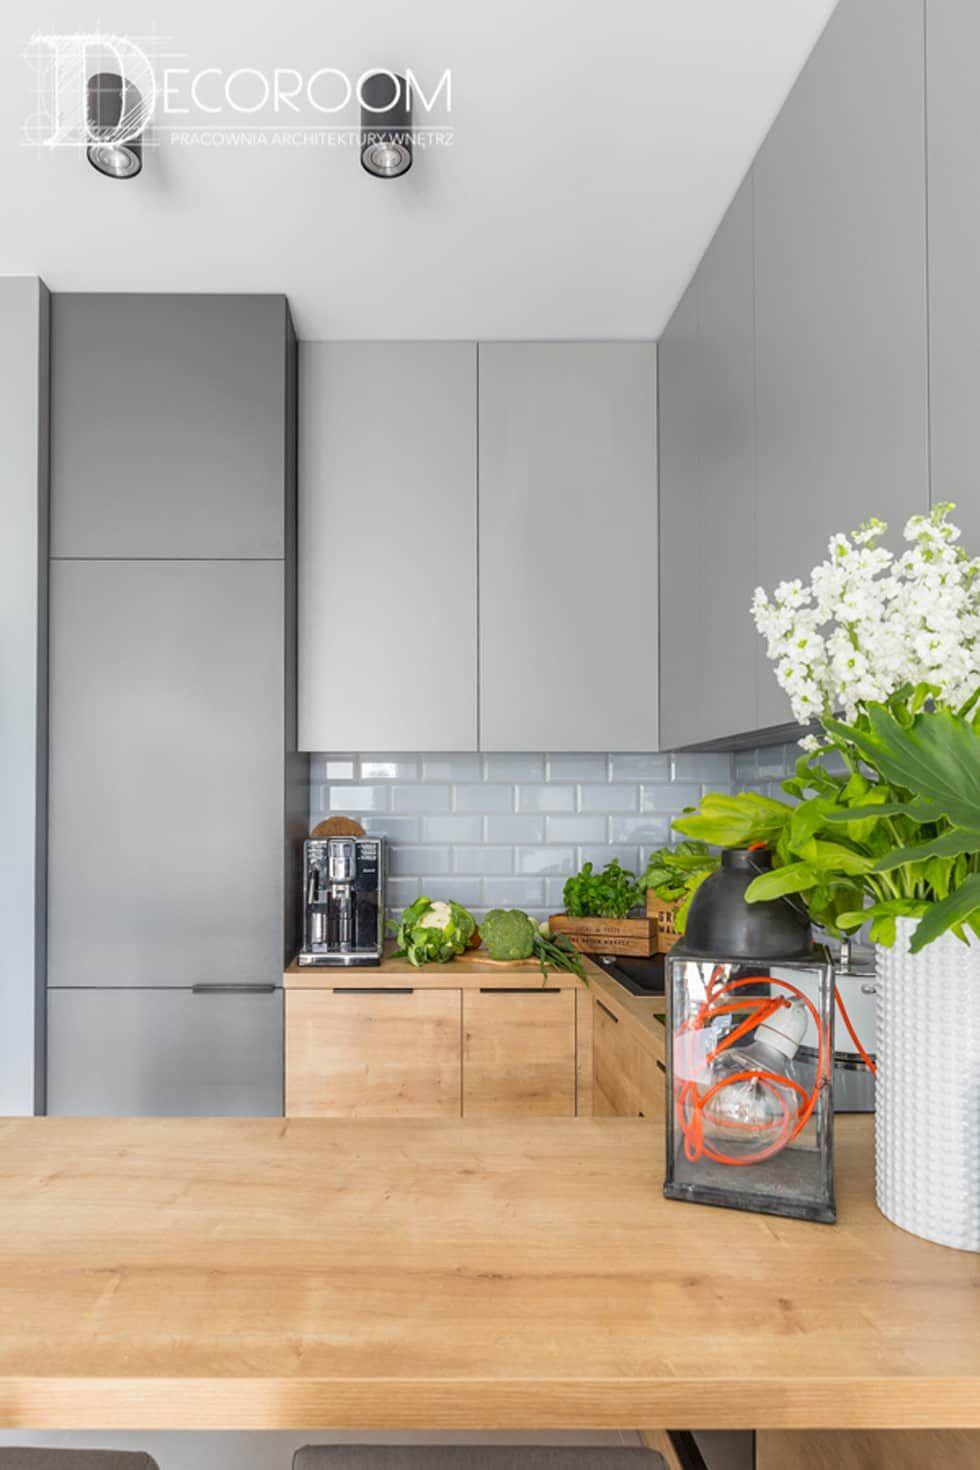 Kawalerka Dla Singla Pracownia Architektury Wnetrz Decoroom Nowoczesna Kuchnia Szary Homify Home Decor Kitchen Kitchen Design Small Kitchen Decor